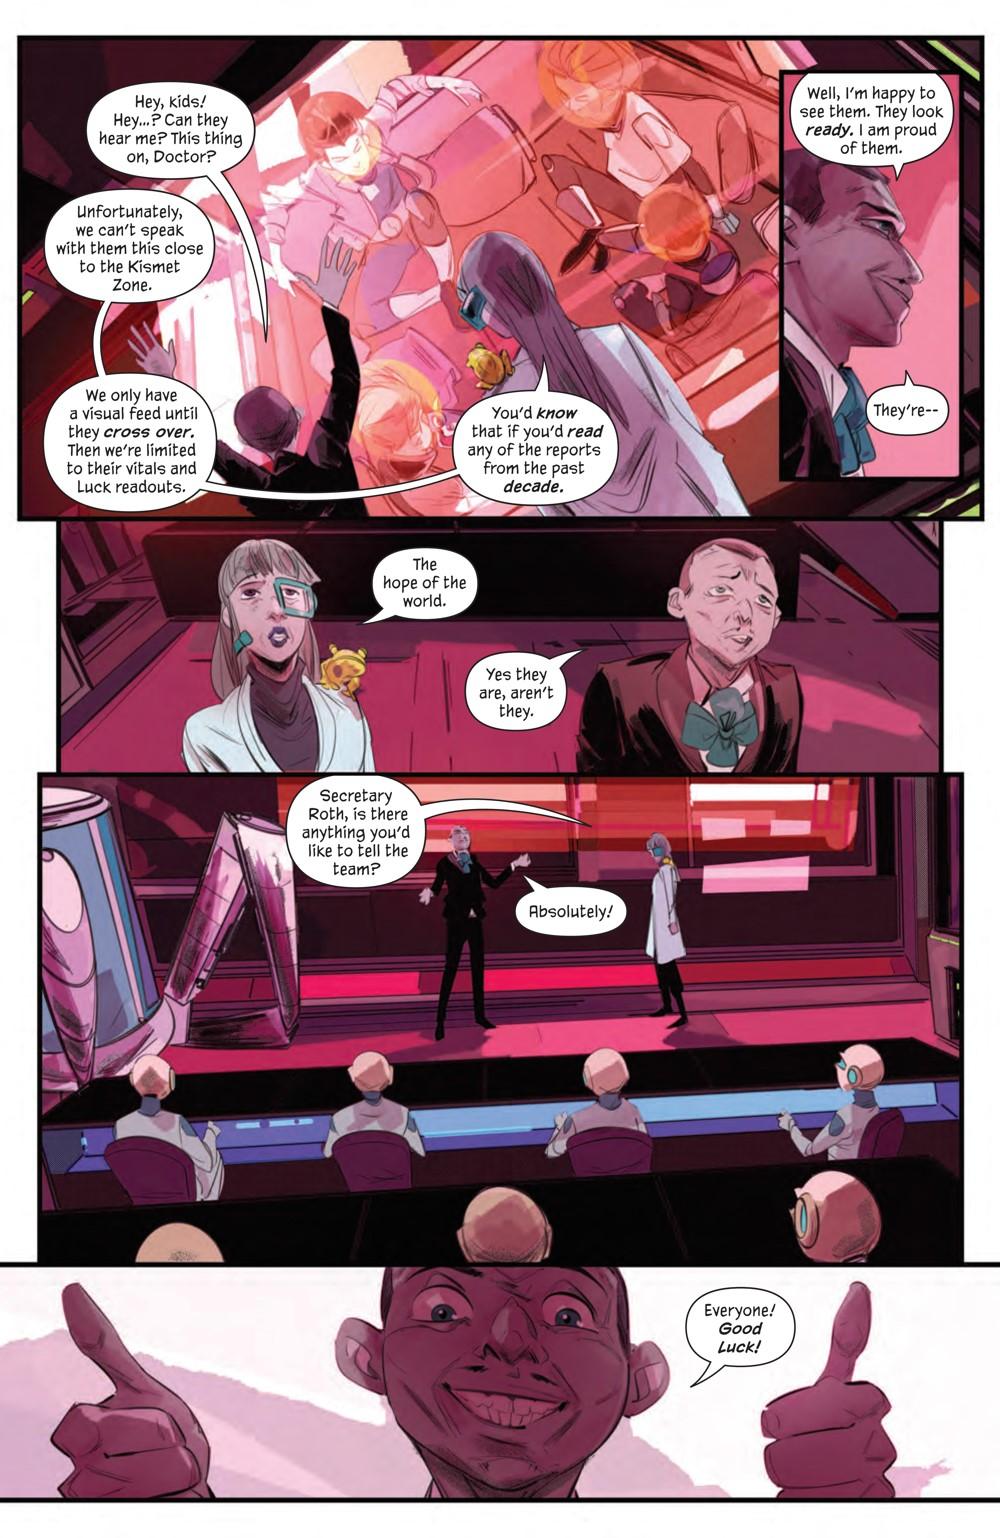 GoodLuck_002_PRESS_5 ComicList Previews: GOOD LUCK #2 (OF 5)